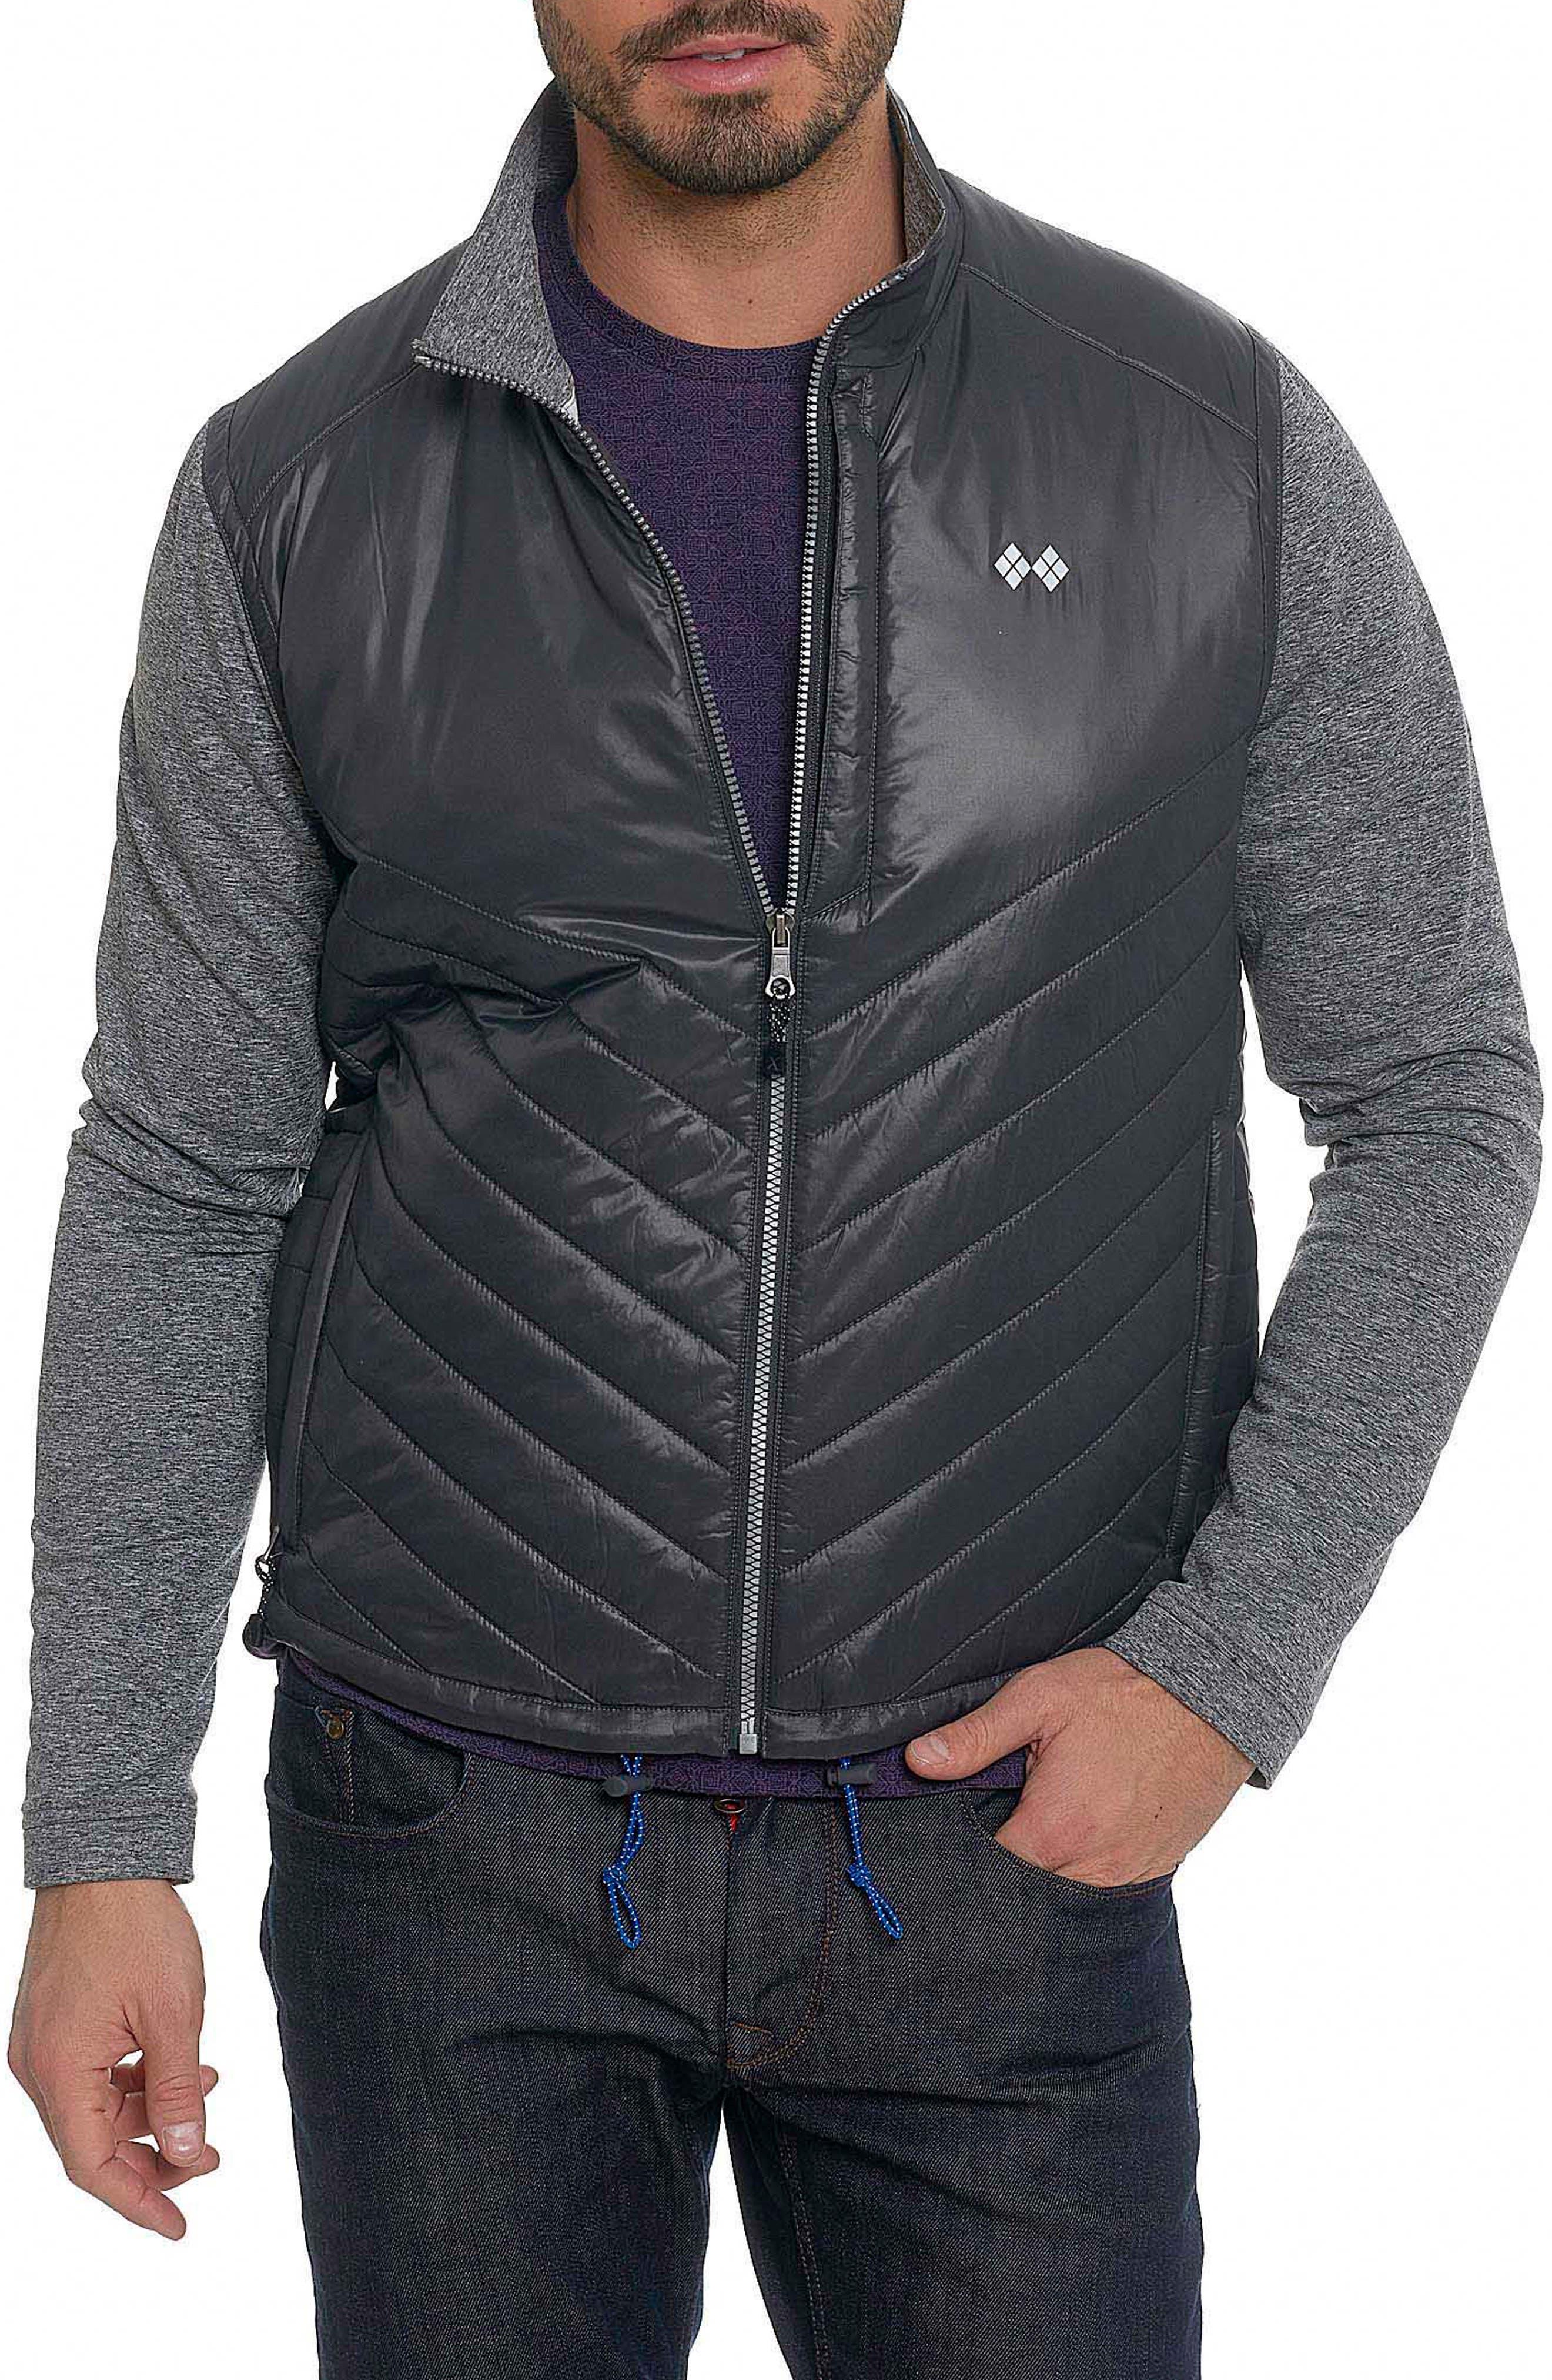 Robert Graham Poconos Tailored Fit Mixed Media Jacket